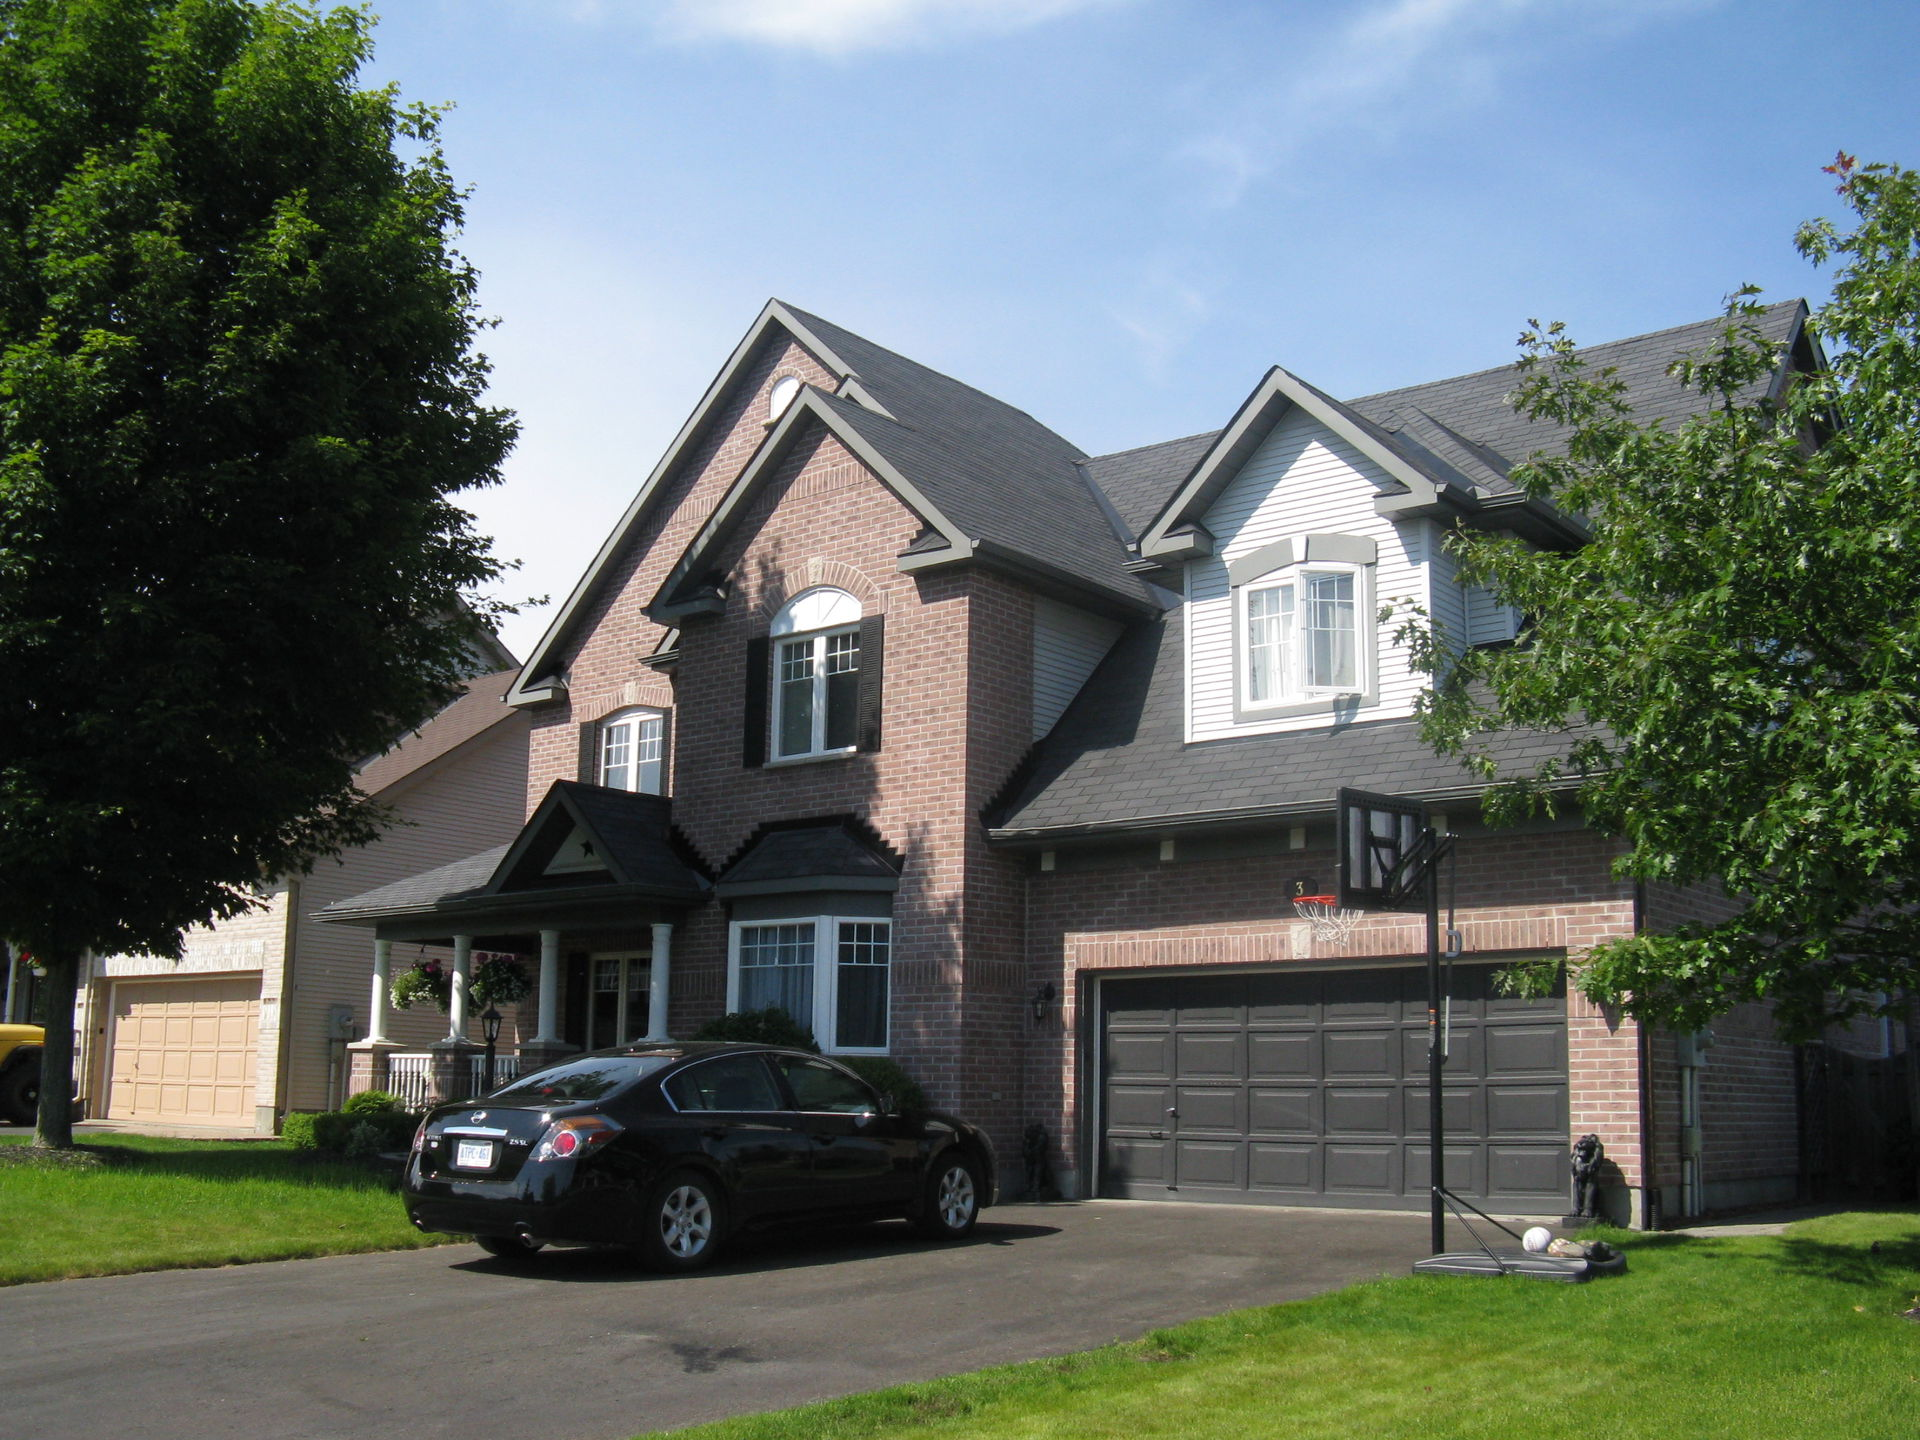 Ottawa Canada- Large home with Pool, Hot tub and Gazebo - Home Exchange